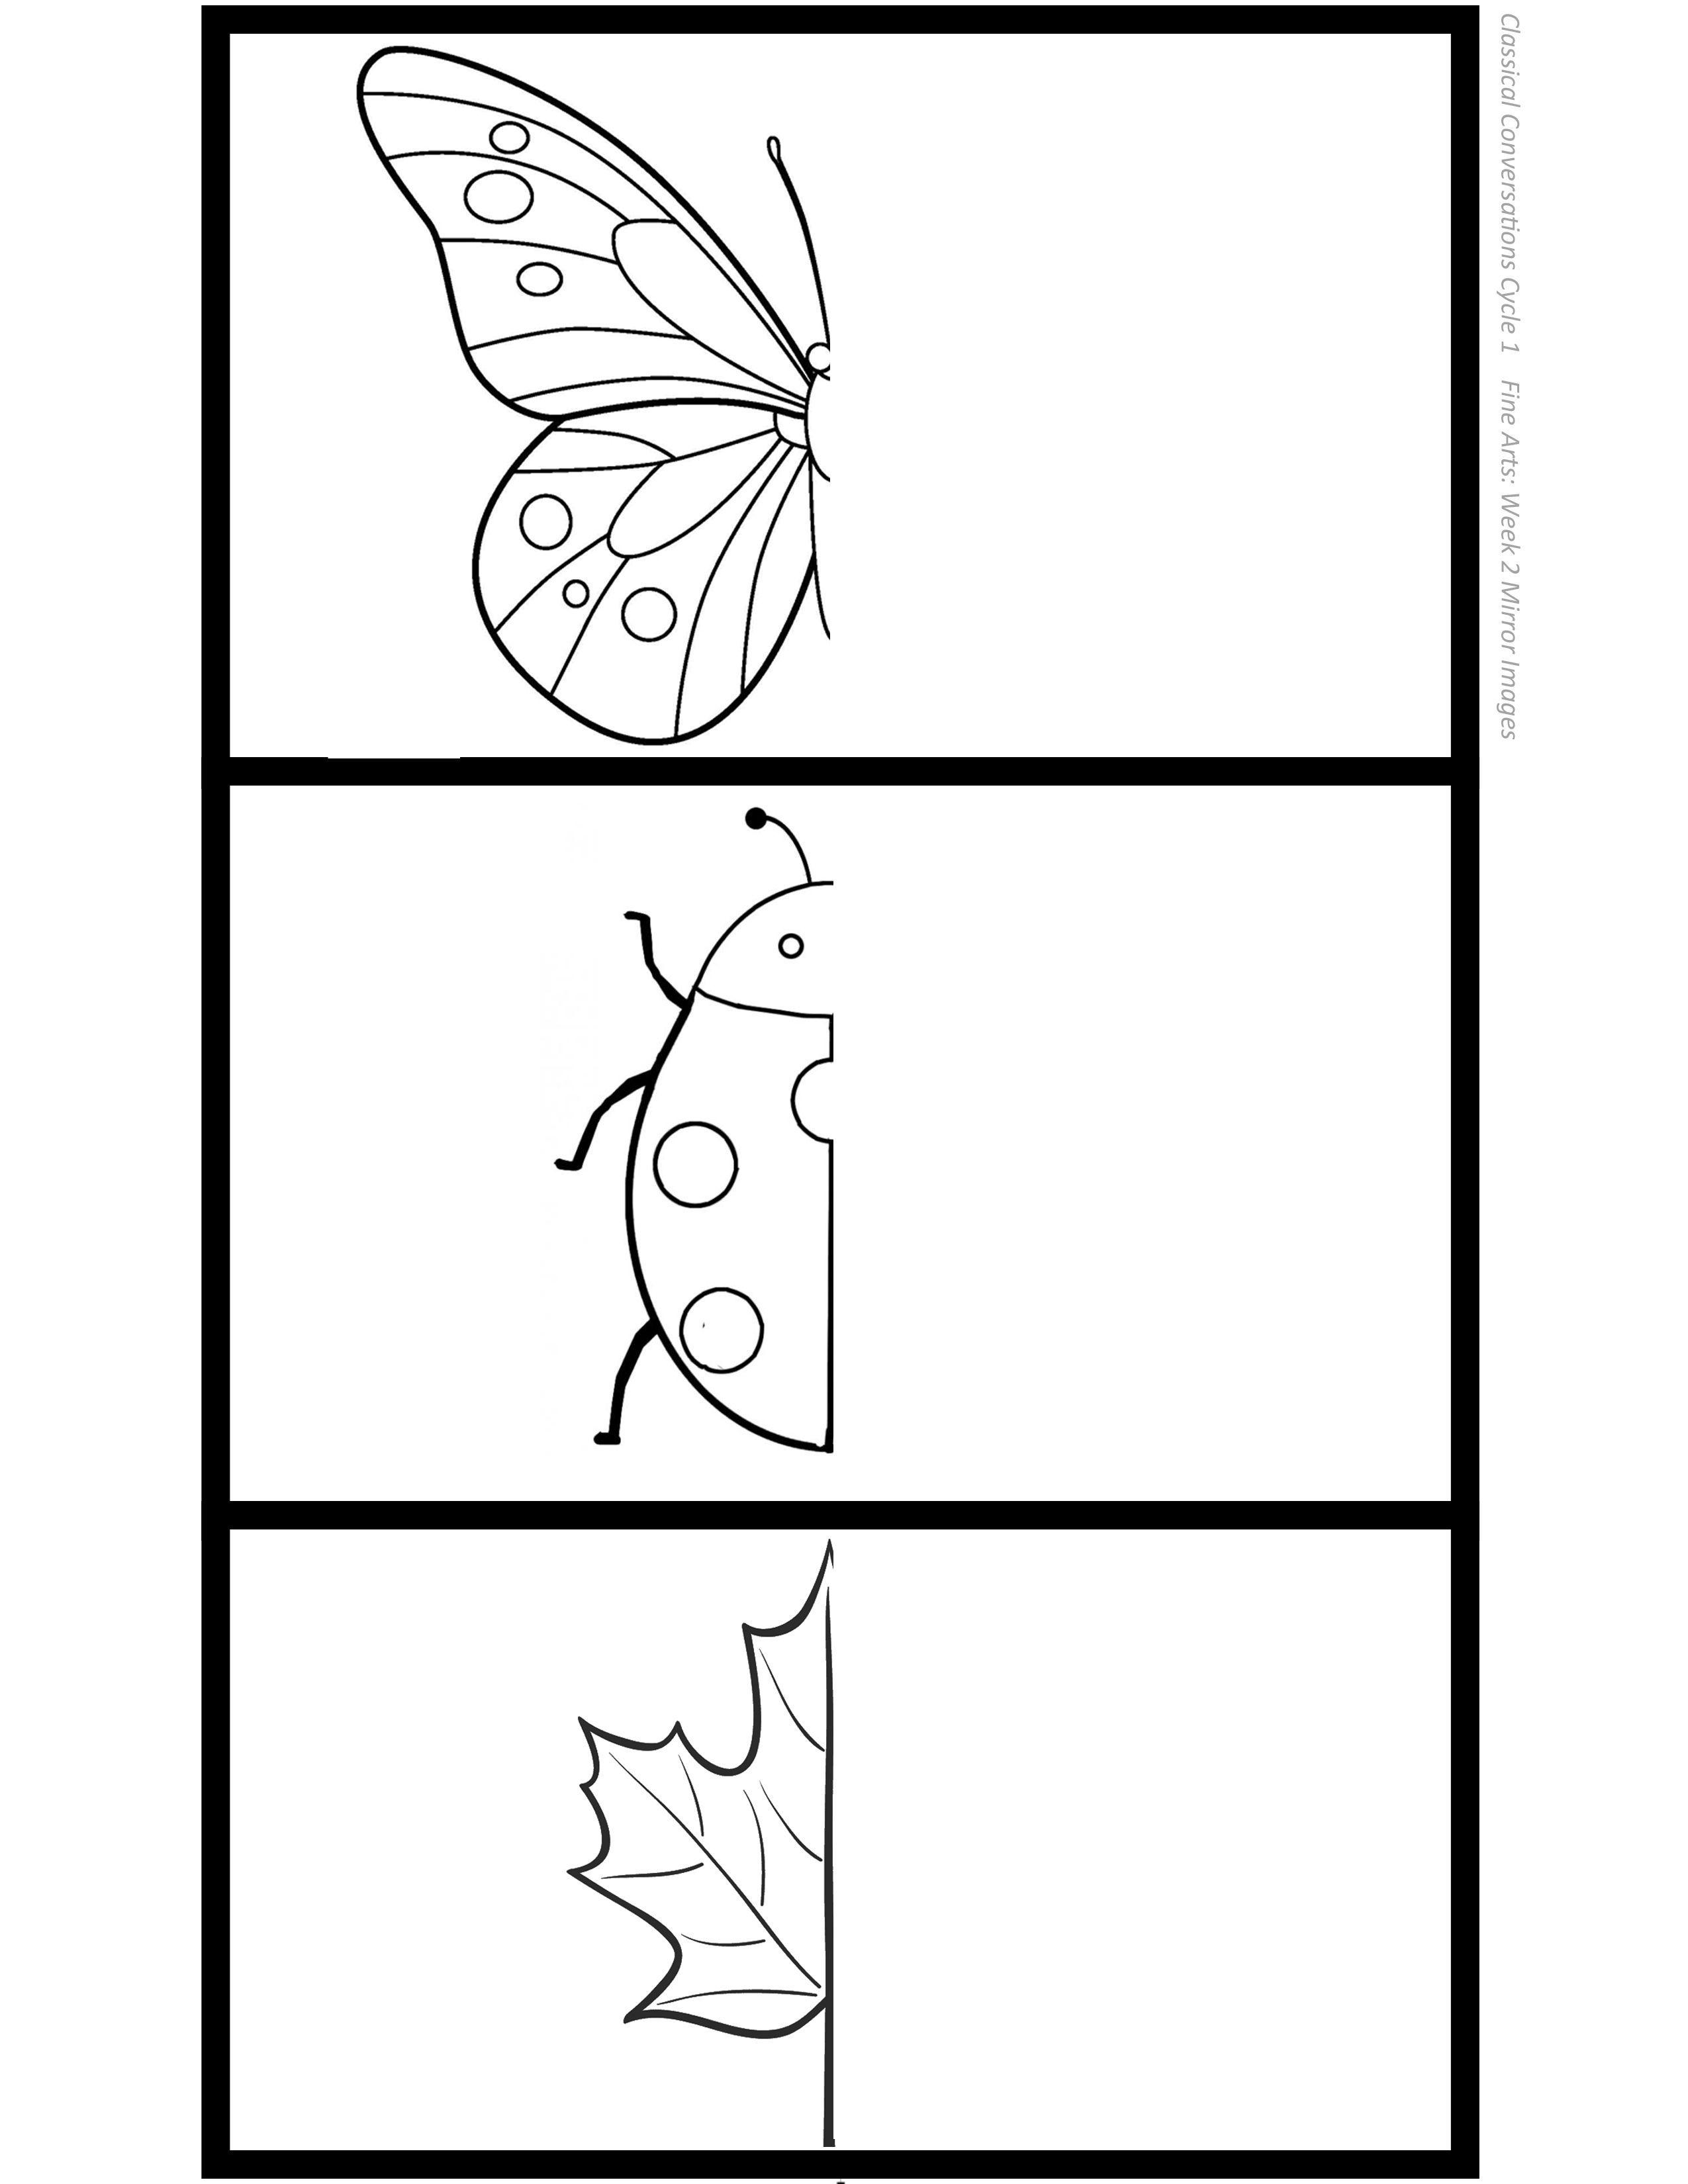 Mirror Image Drawing Printable